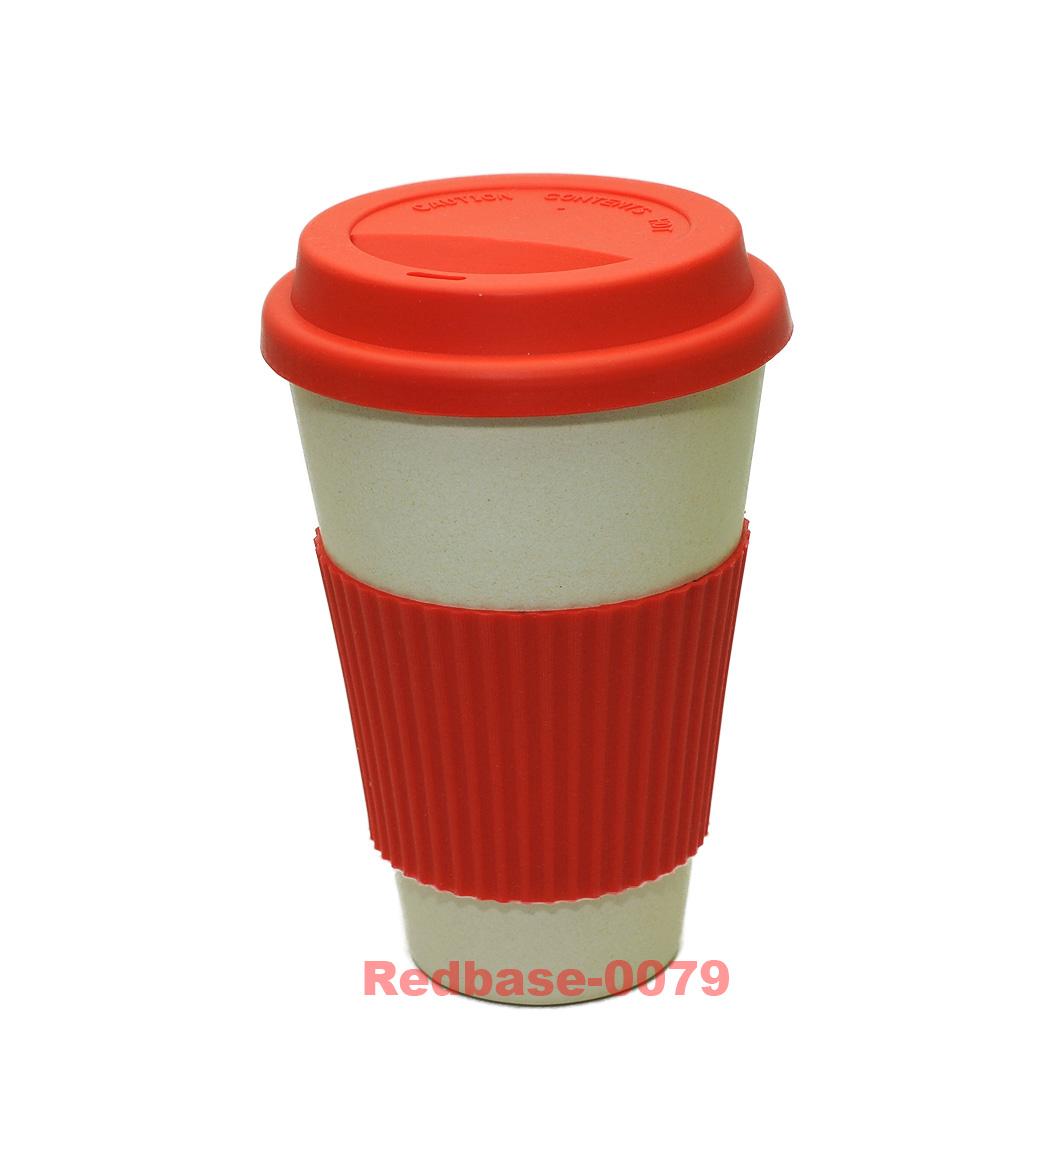 Reusable-Eco-Friendly-Bamboo-Fibre-Nature-Travel-Coffee-Mug-Cup